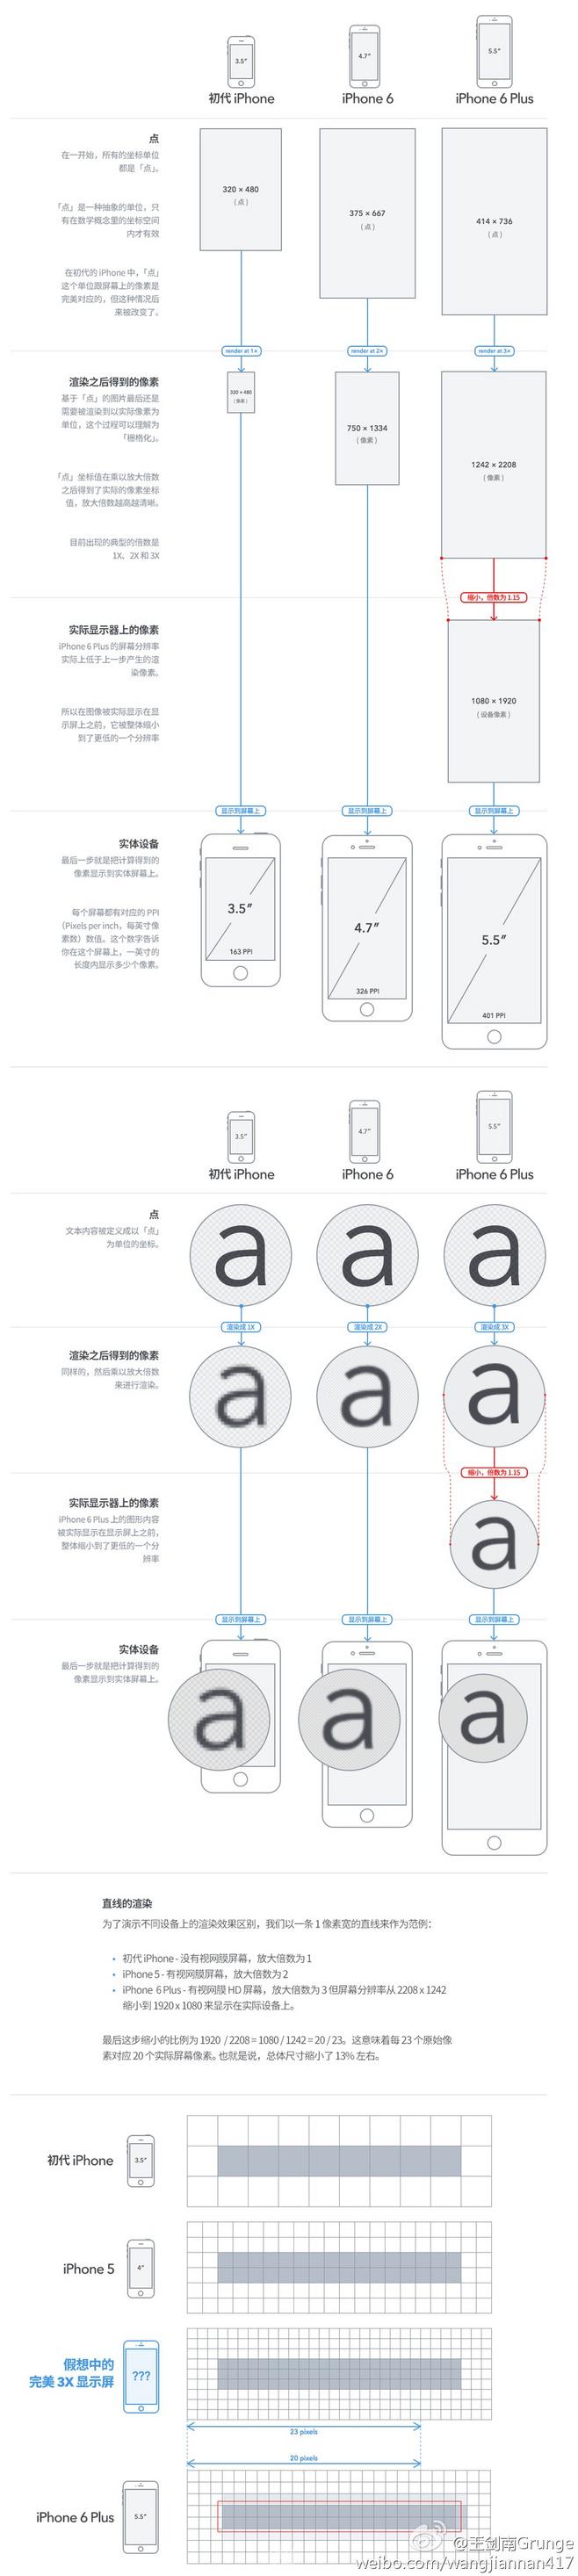 iphone 6 Plus的屏幕分辨率